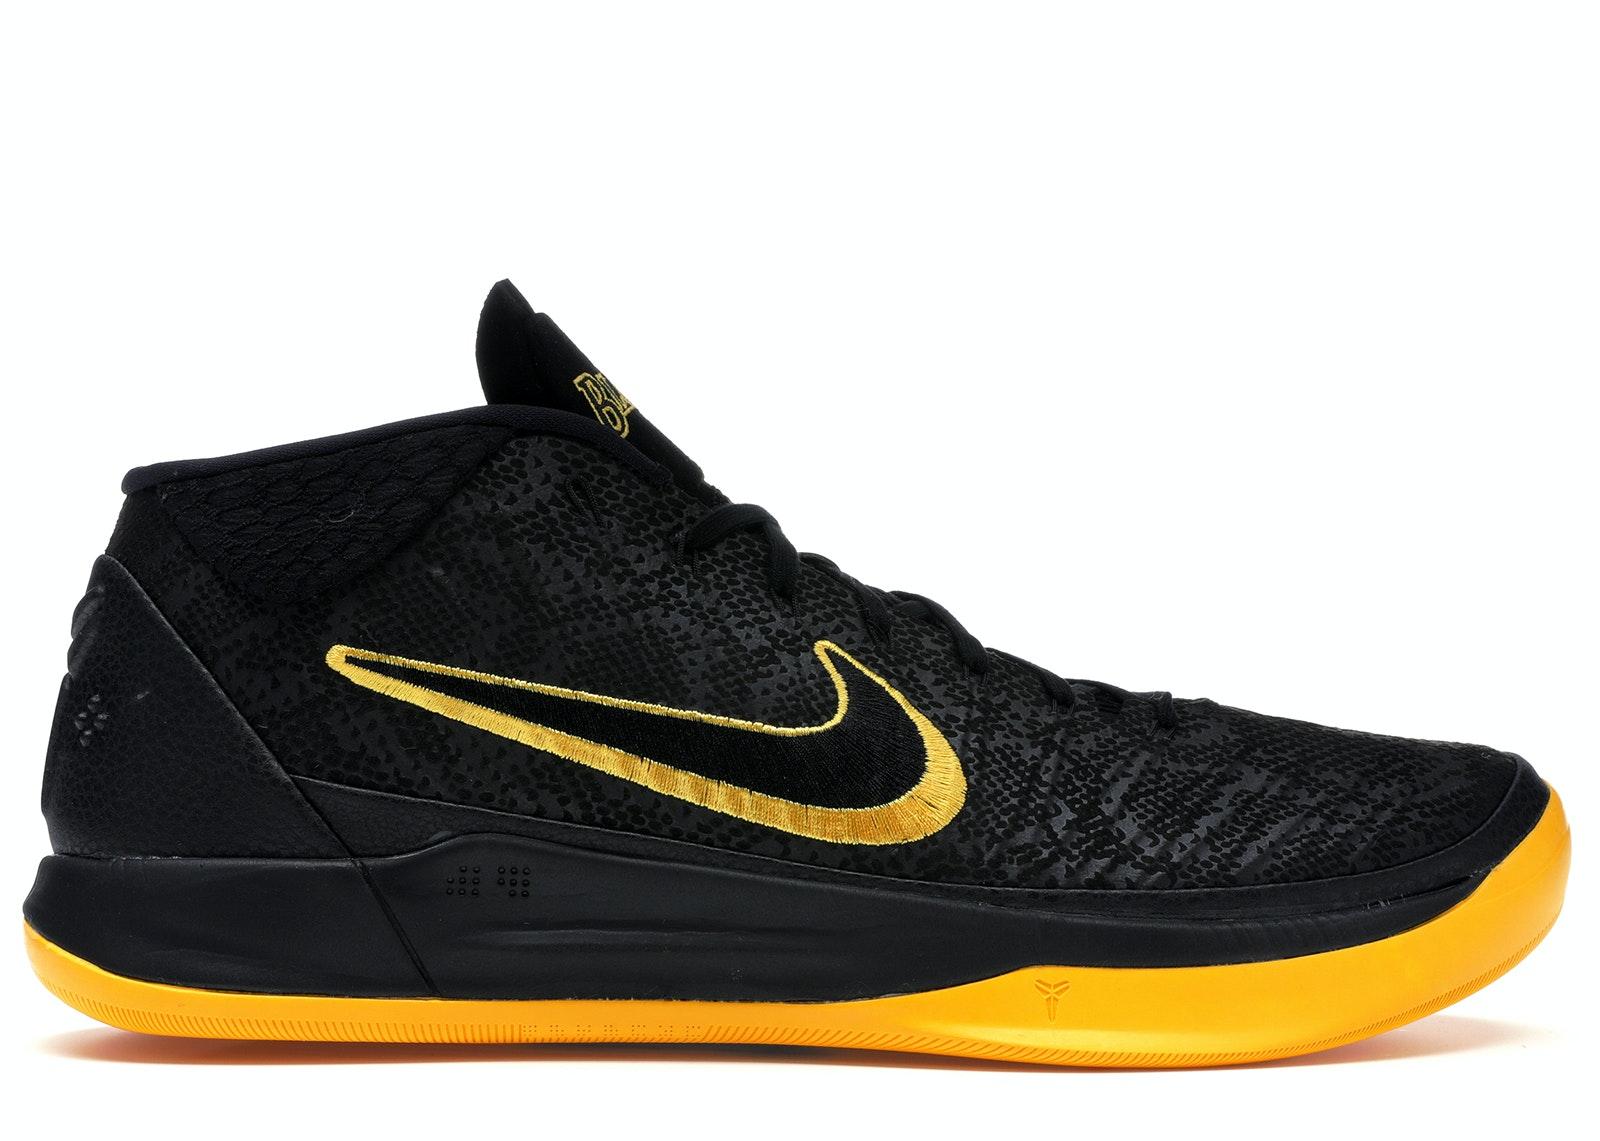 Kobe A.D. Lakers Black Mamba